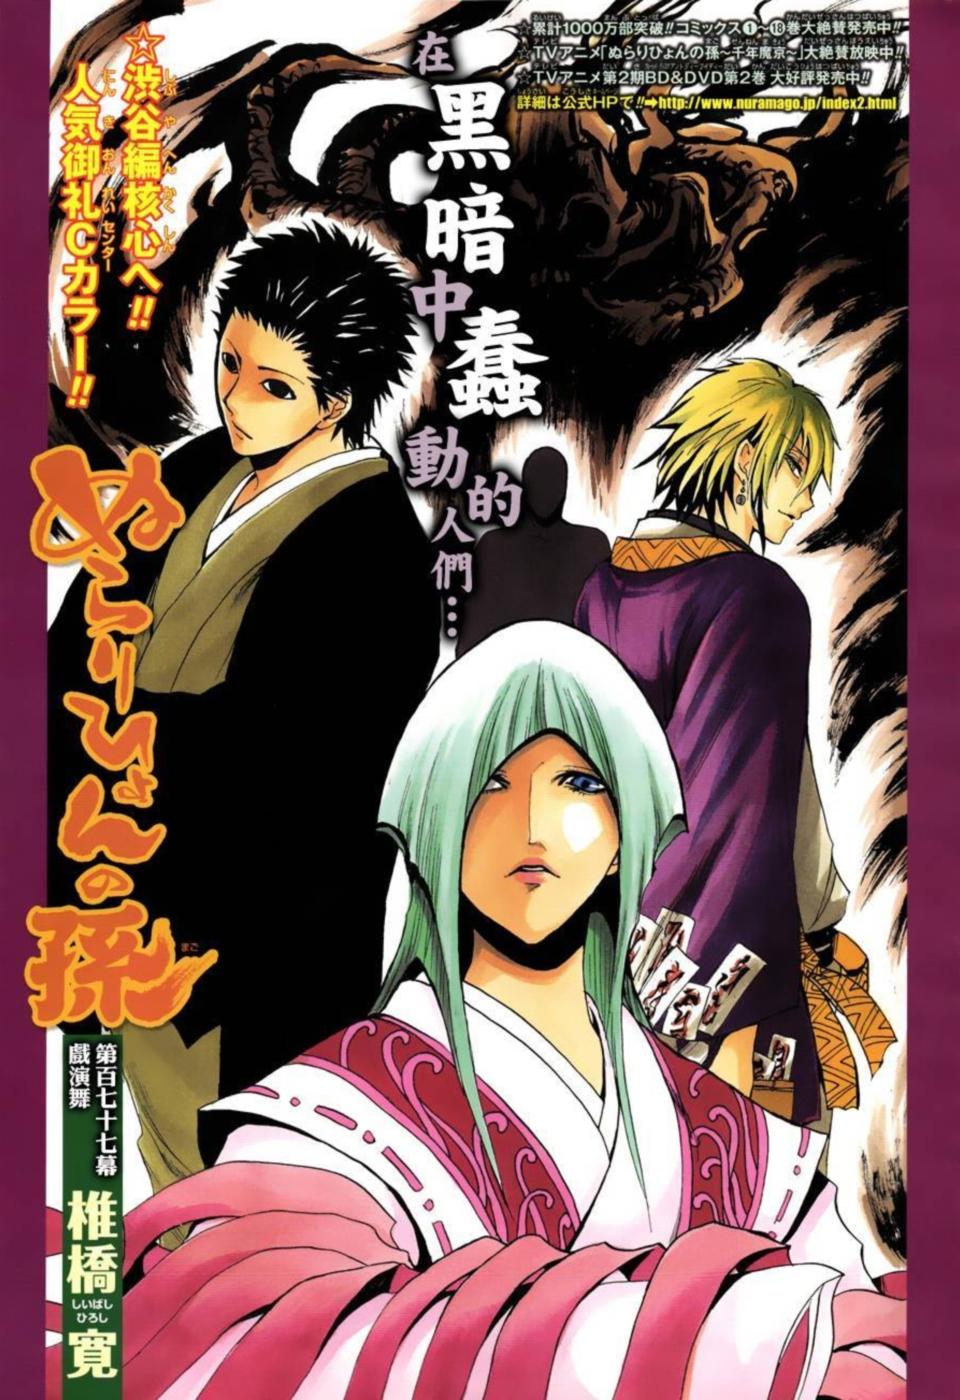 Nurarihyon no Mago Nura Rise Of The Yokai Clan Image